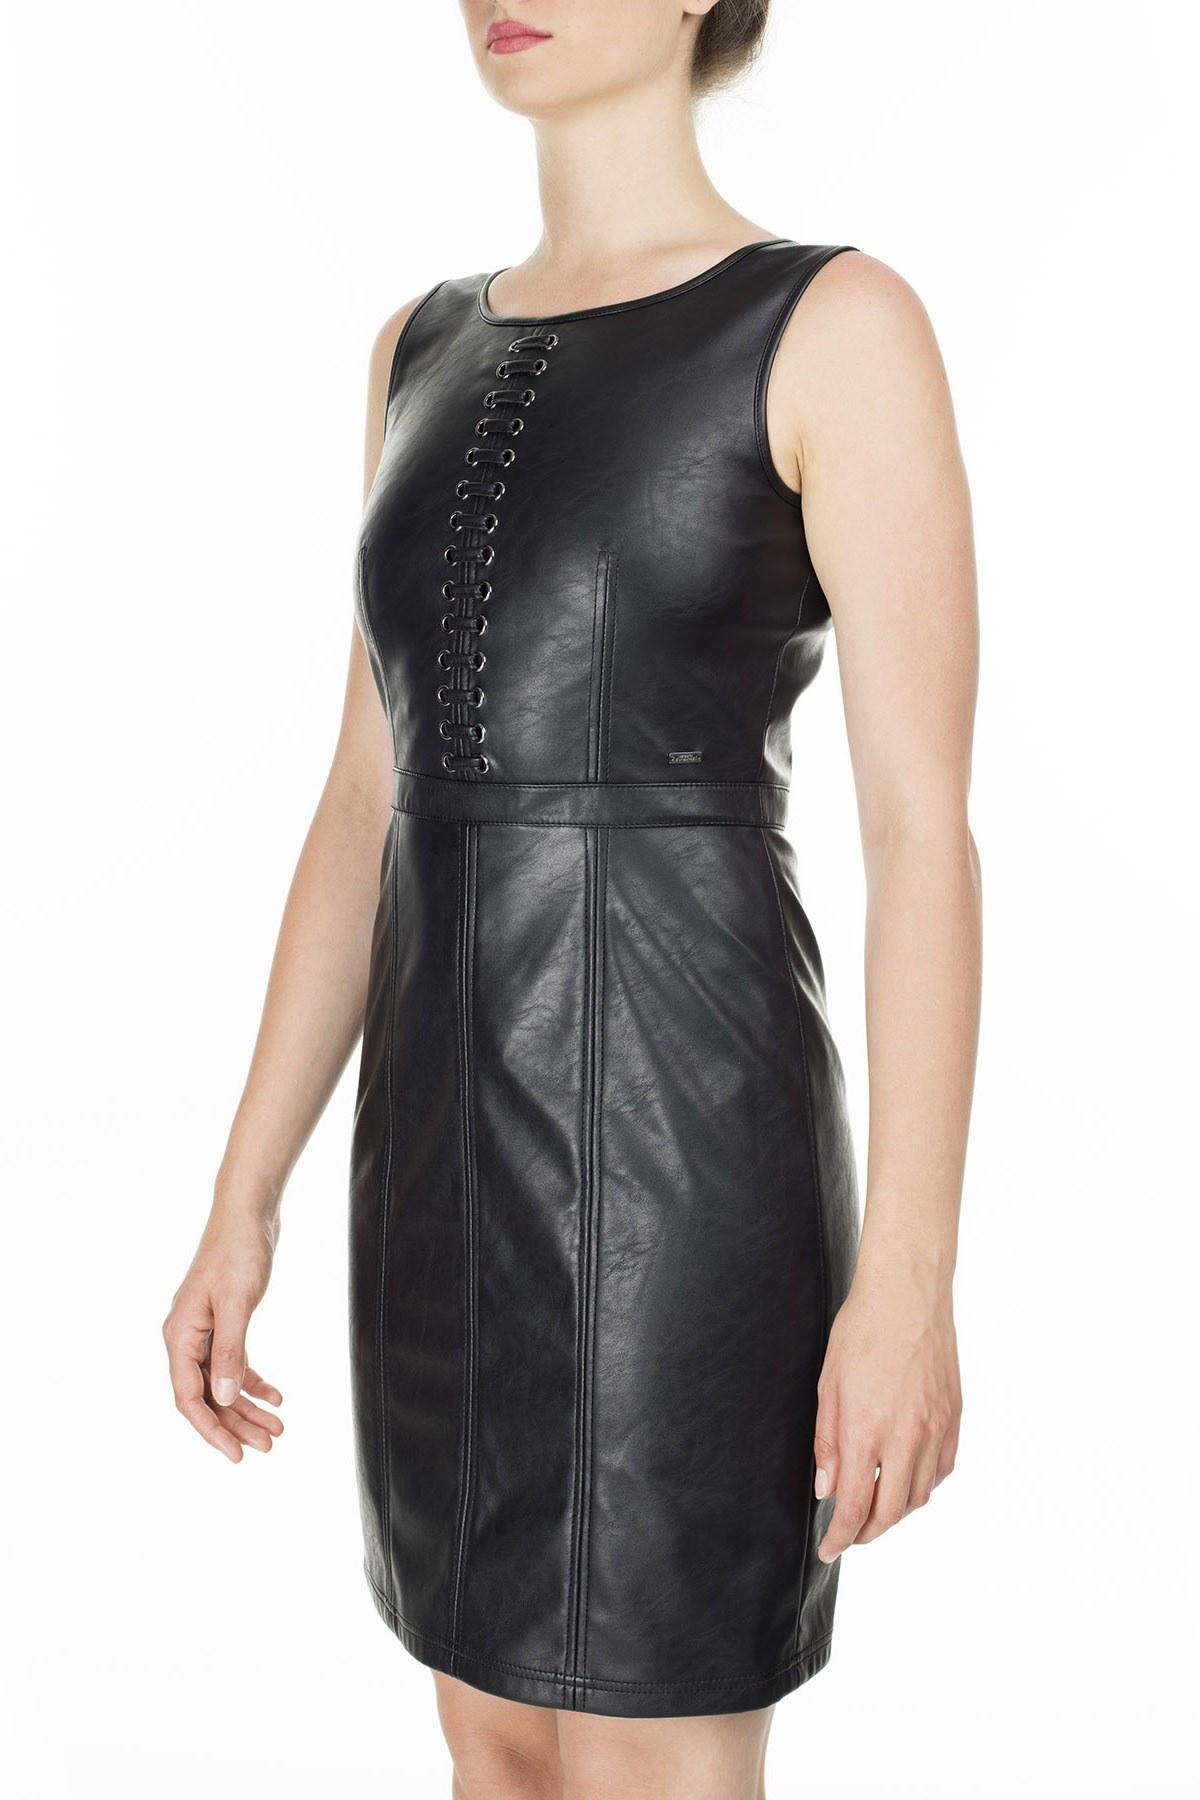 Armani Exchange Bayan Elbise S 6GYA44 YNRFZ 1200 SİYAH